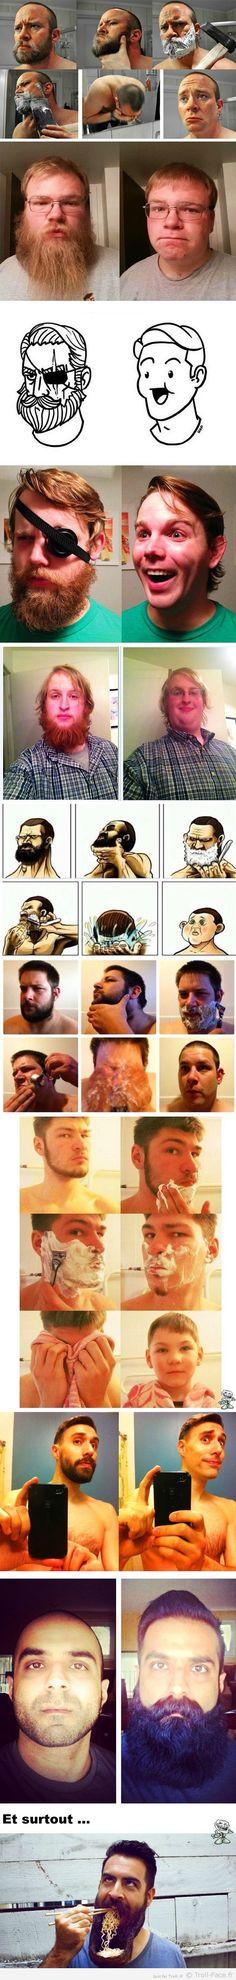 10 raisons pourquoi tu ne devrais jamais raser ta barbe